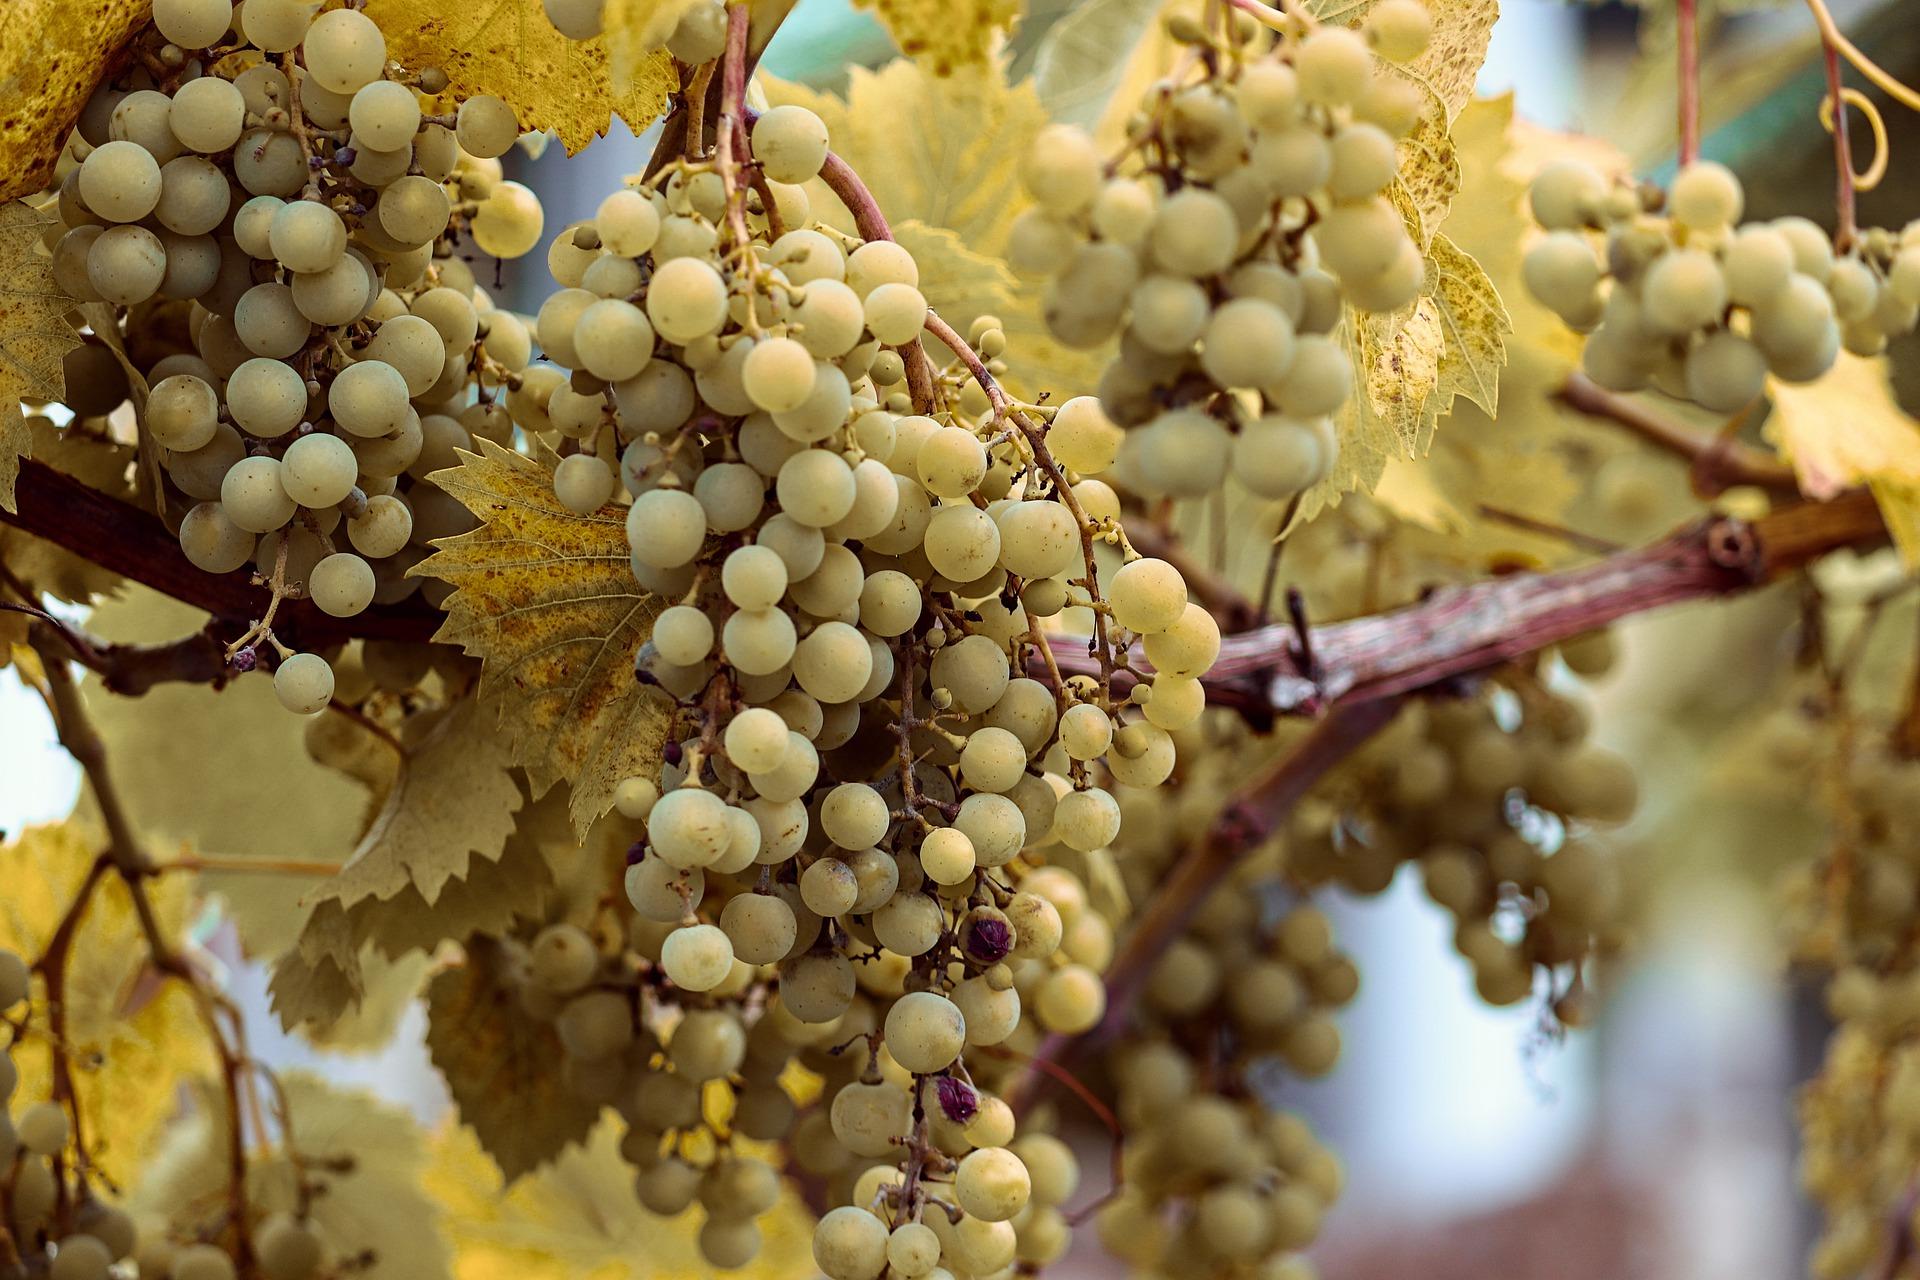 grapes-4421752_1920.jpg